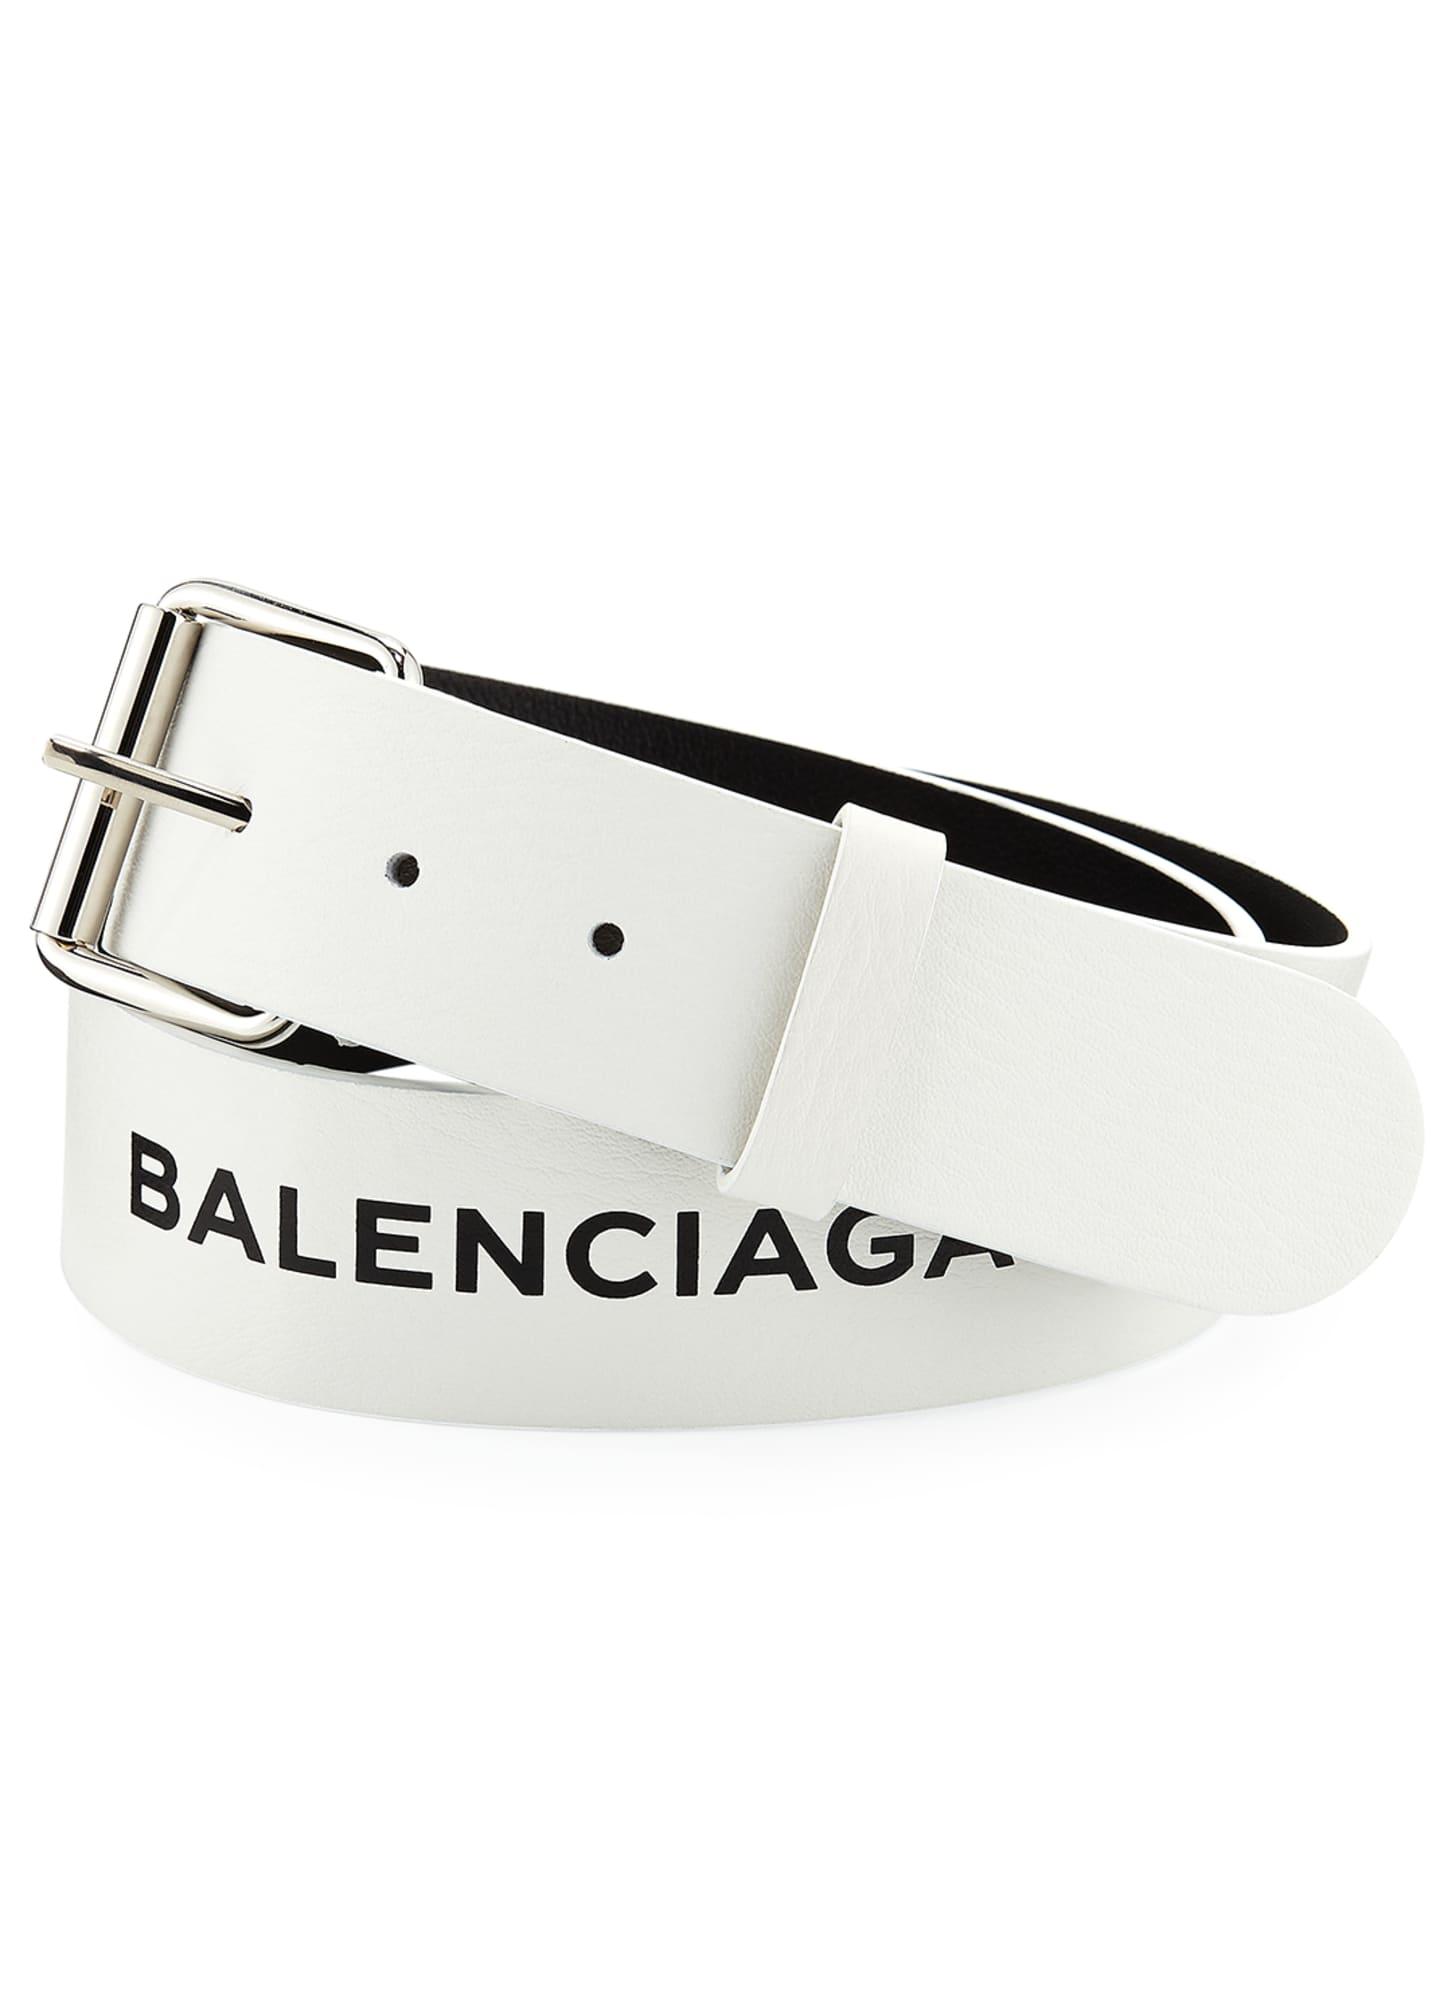 Balenciaga Men's Printed Single Logo Leather Belt